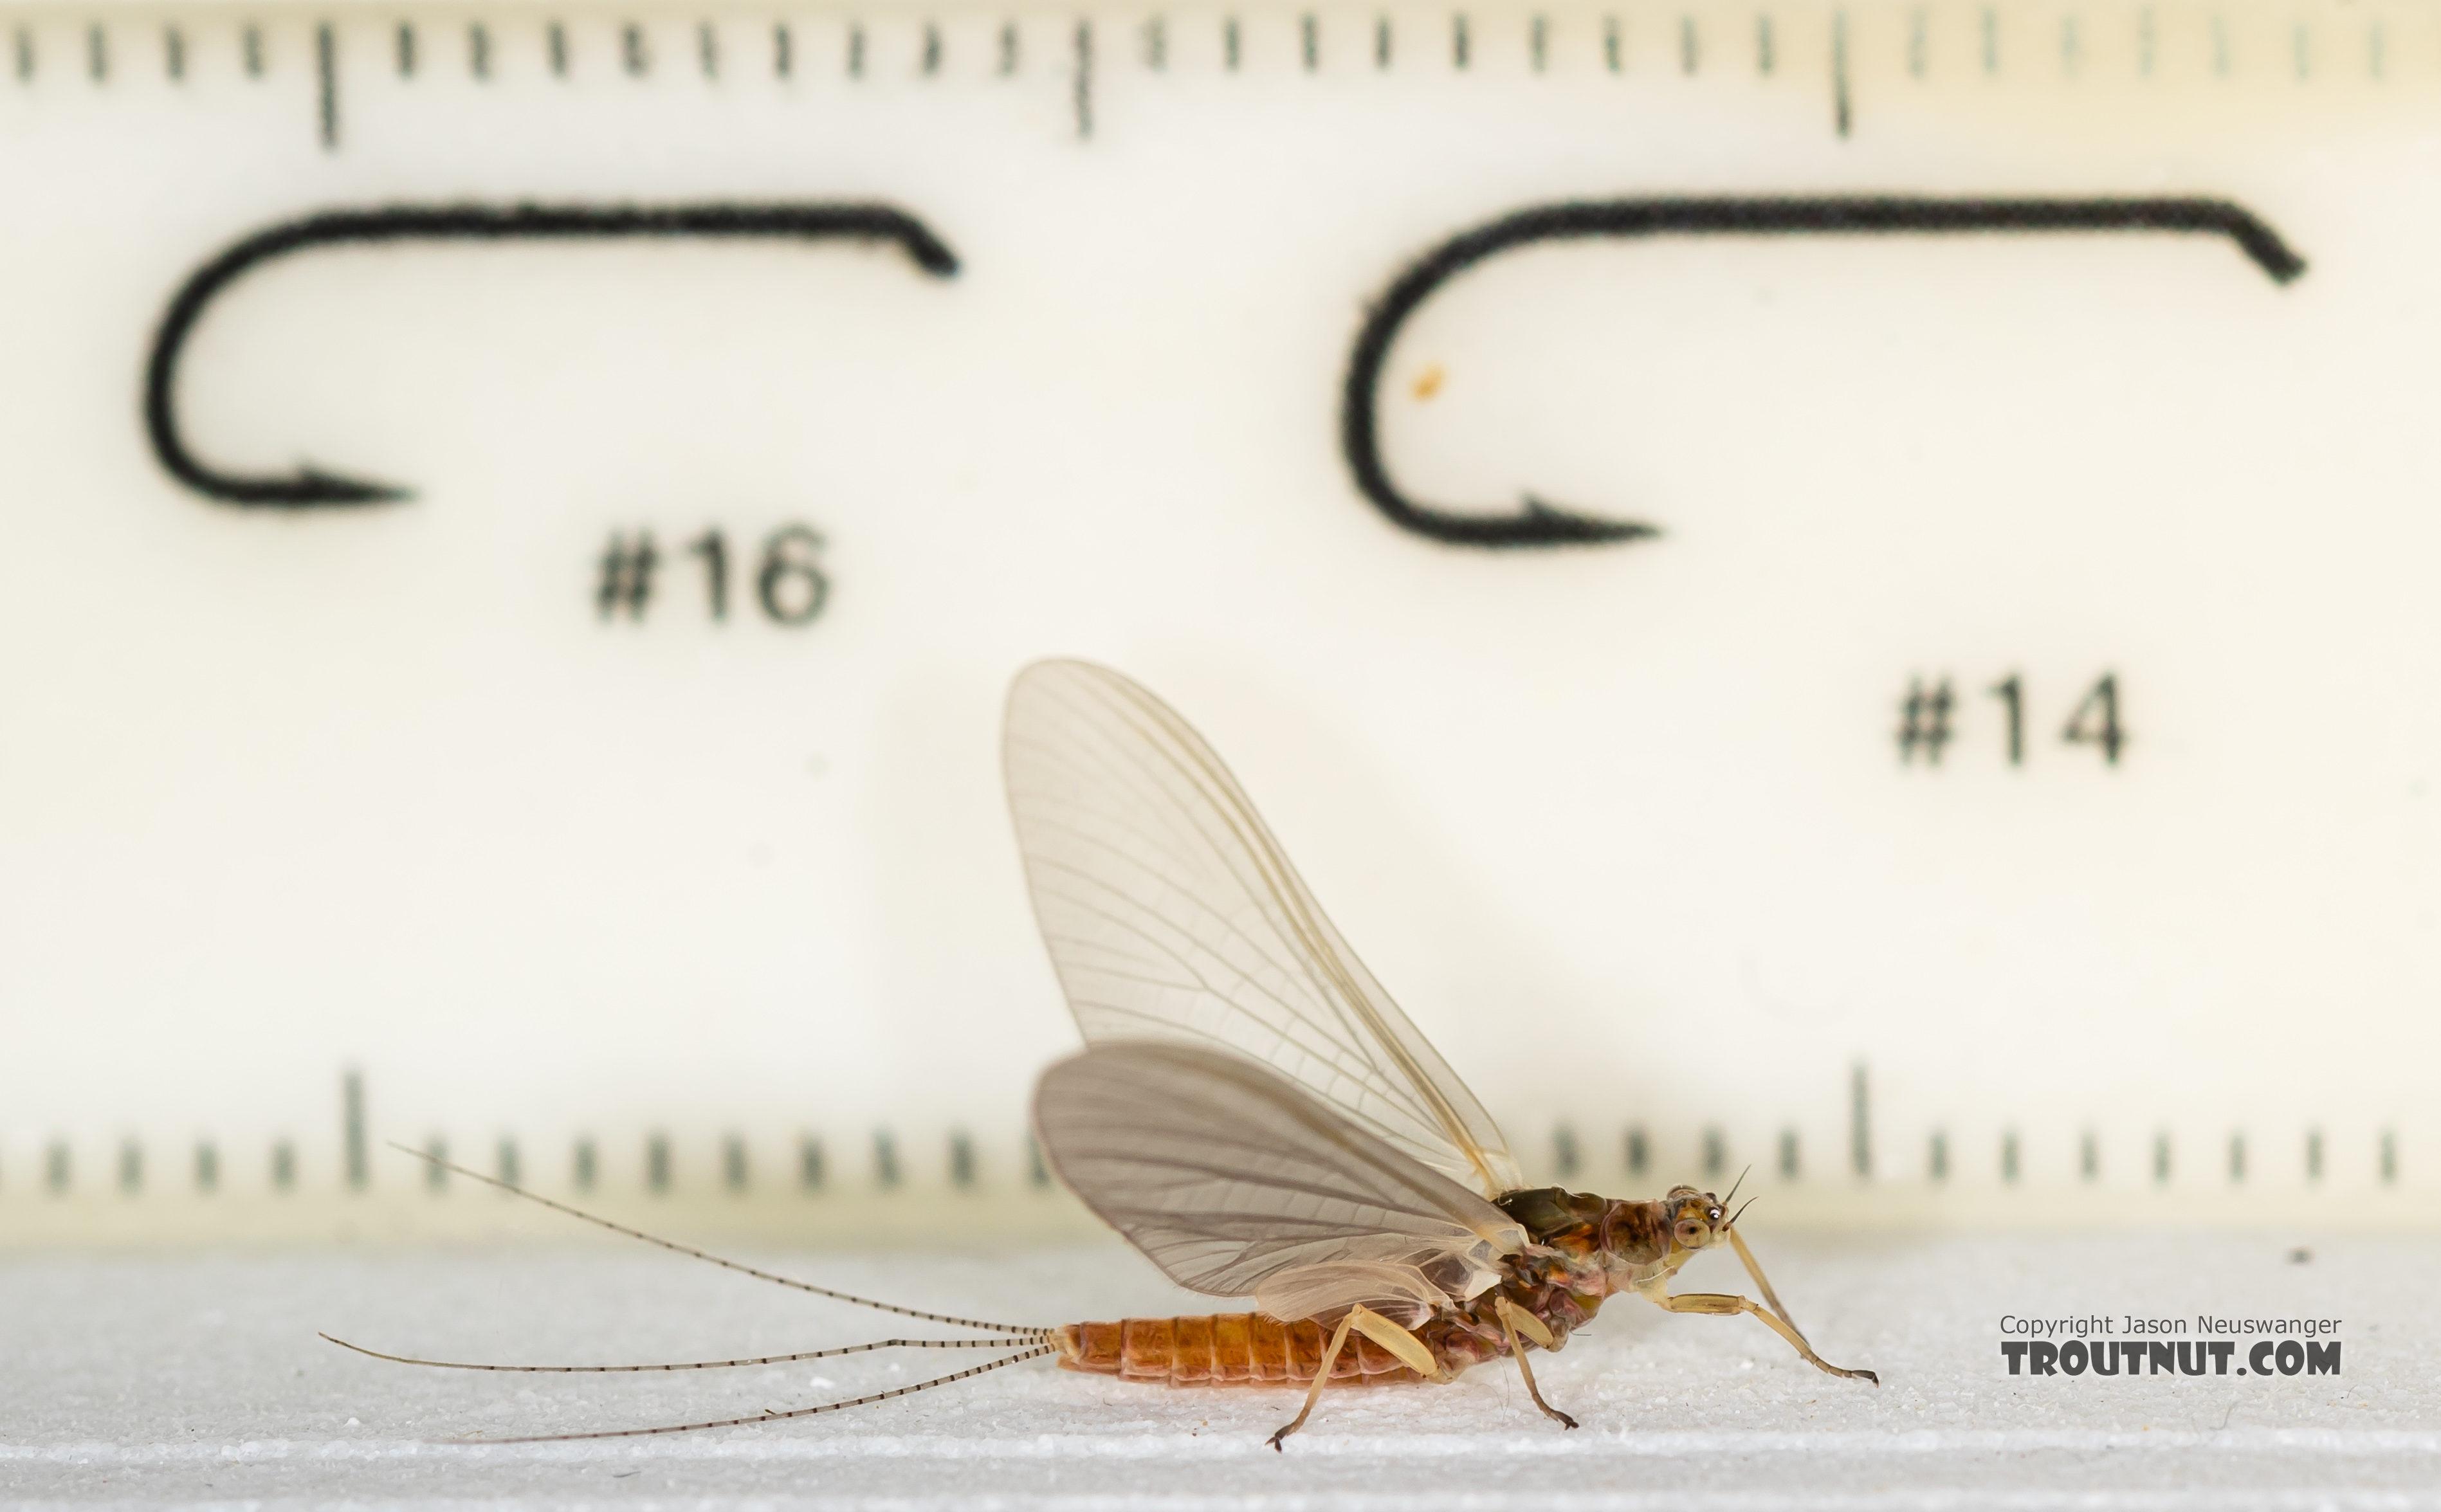 Female Ephemerella aurivillii Mayfly Dun from the Madison River in Montana